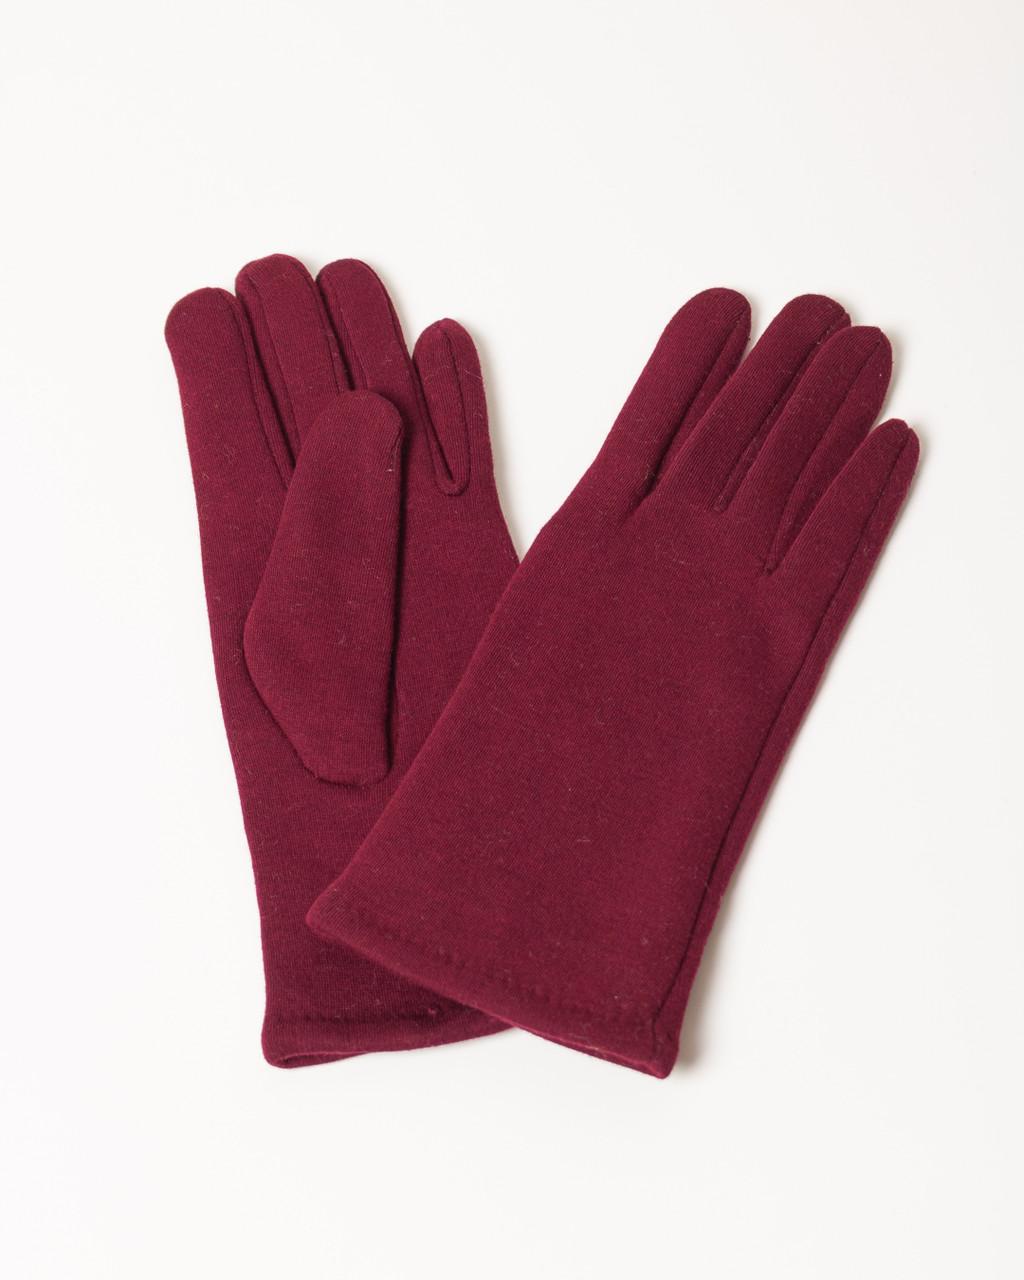 Перчатки женские GLOVES 7487 MURDUM